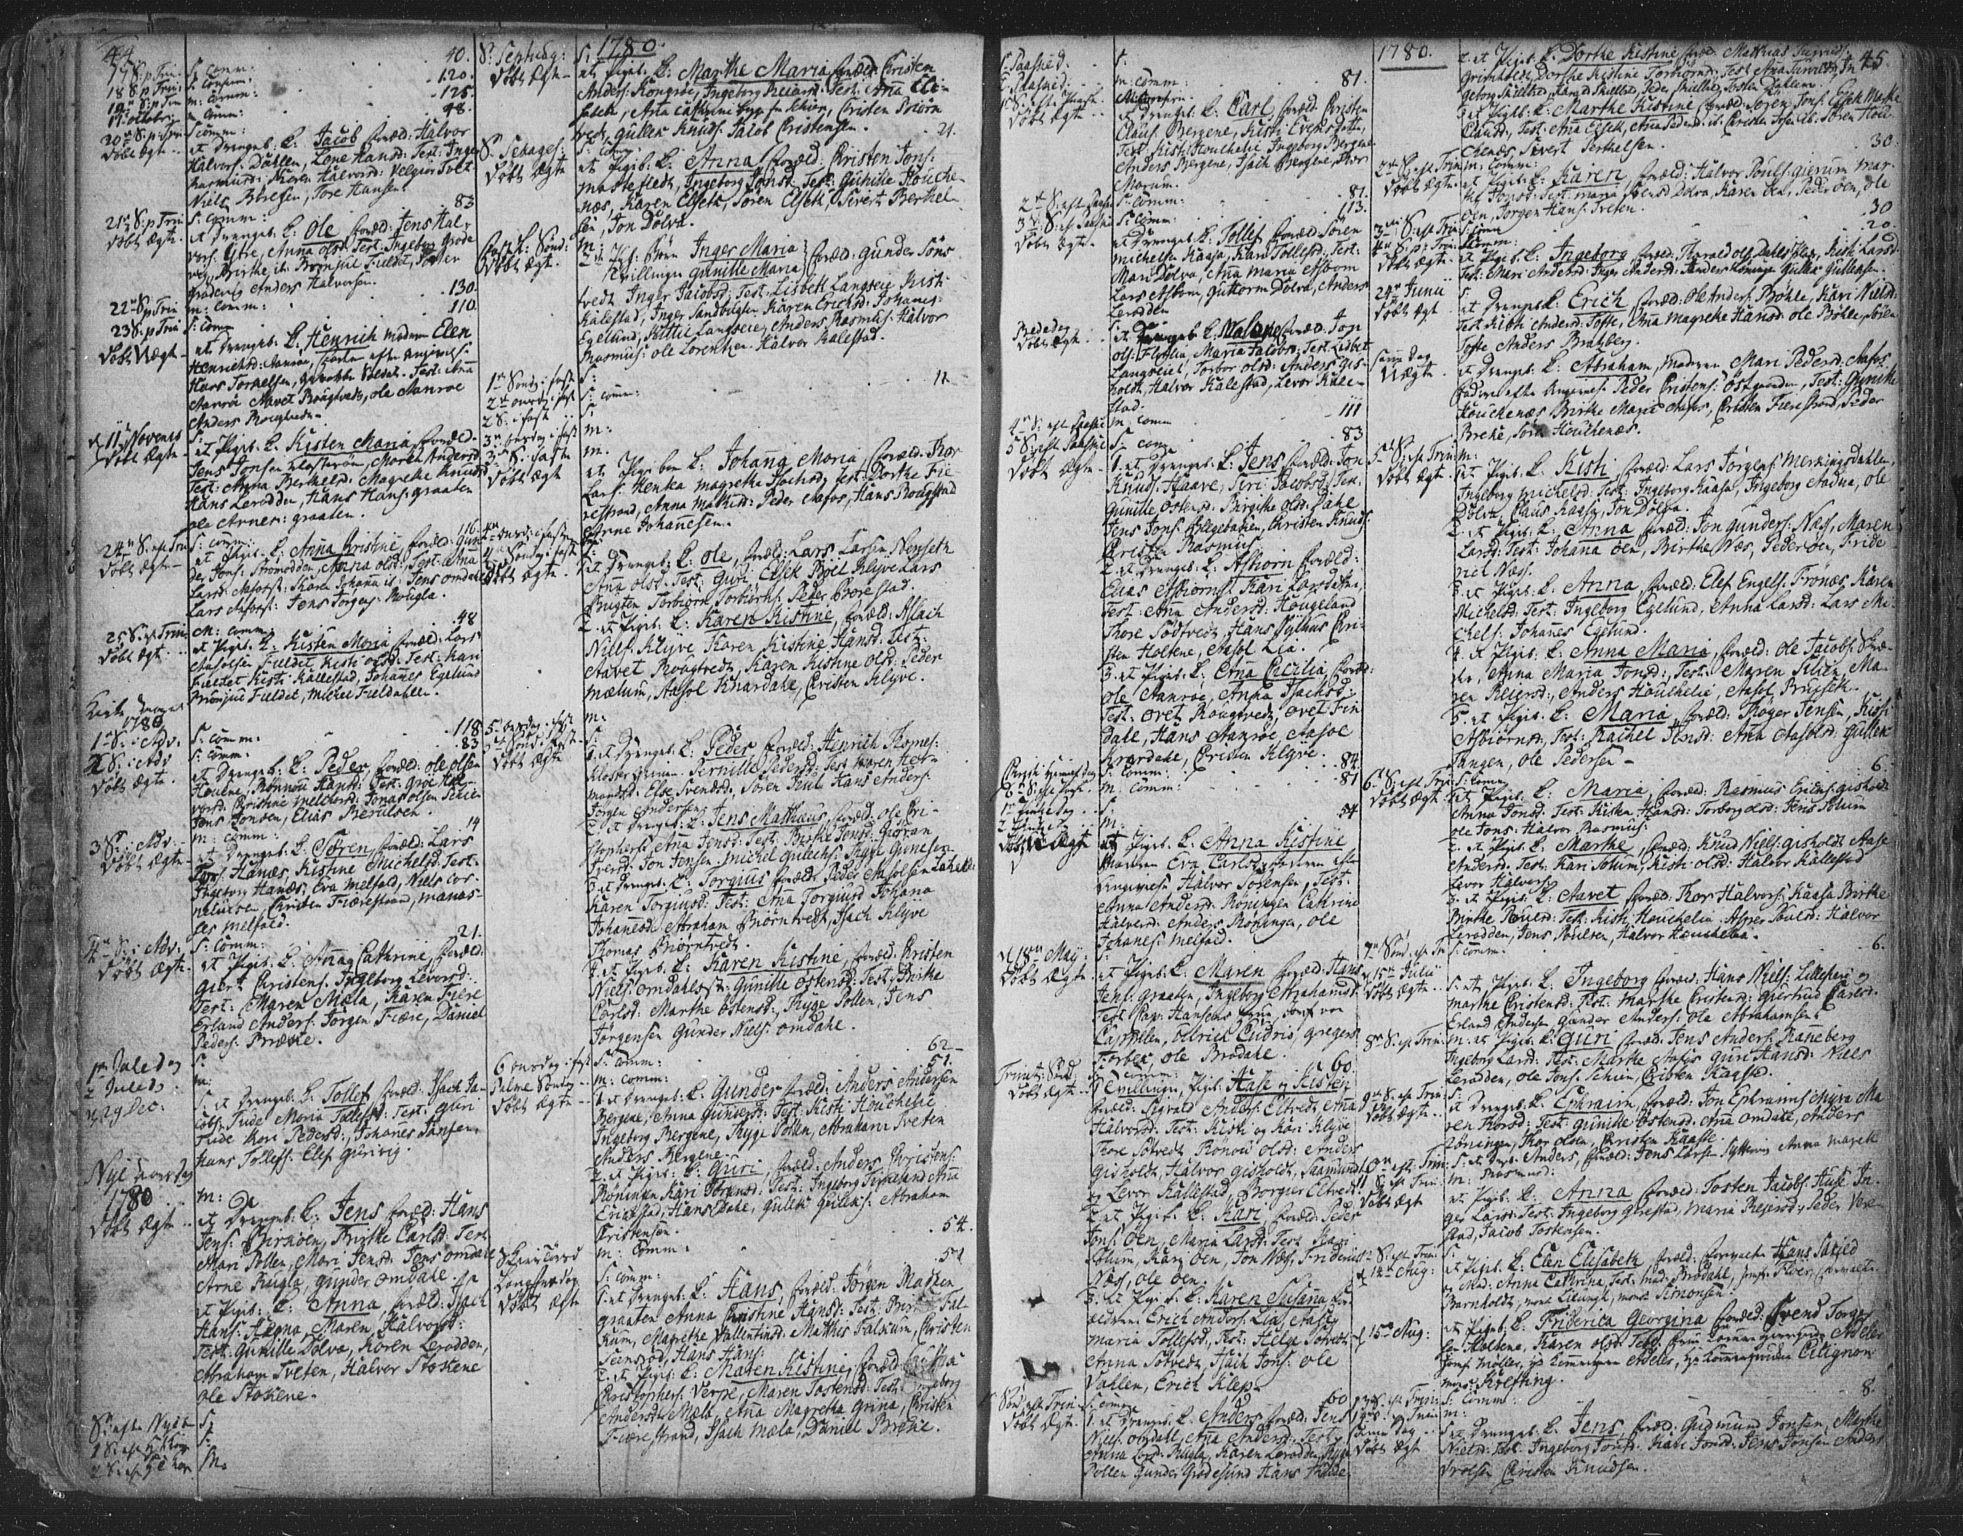 SAKO, Solum kirkebøker, F/Fa/L0003: Ministerialbok nr. I 3, 1761-1814, s. 44-45